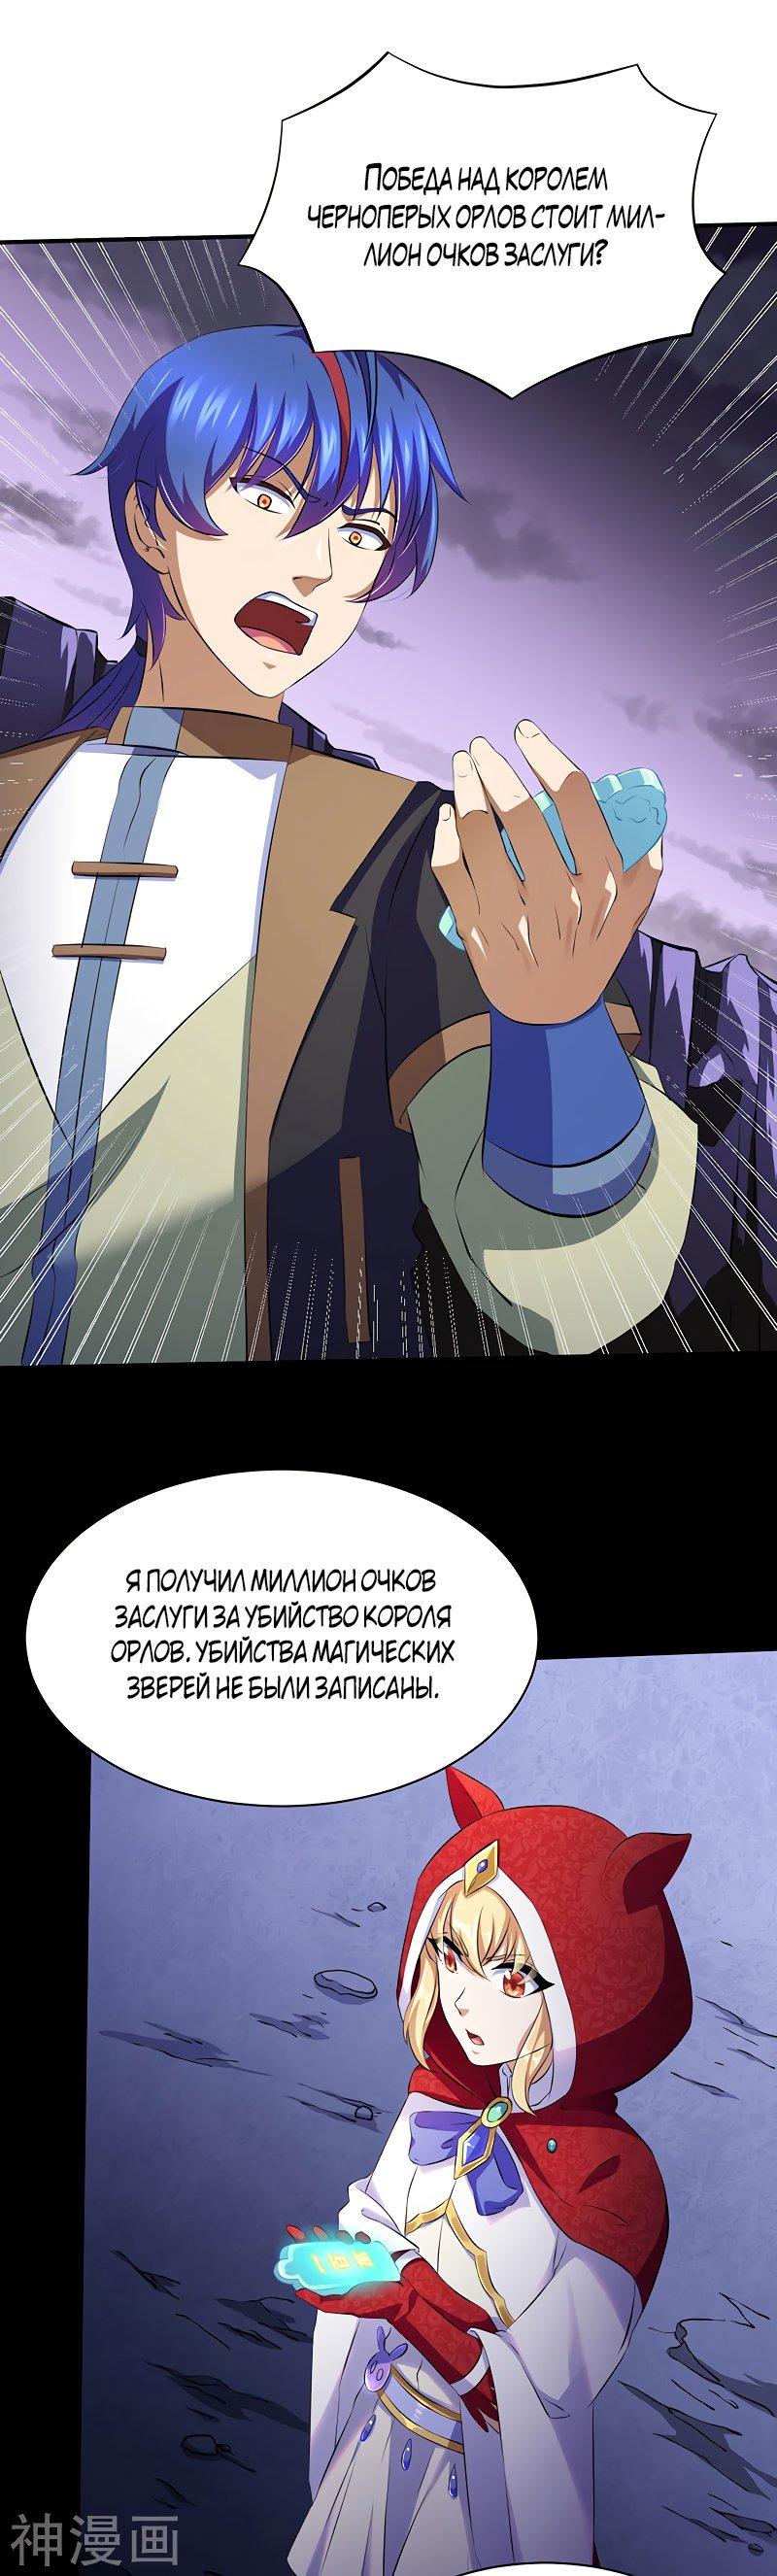 Манга Царство боевых искусств - Глава 121 Страница 1